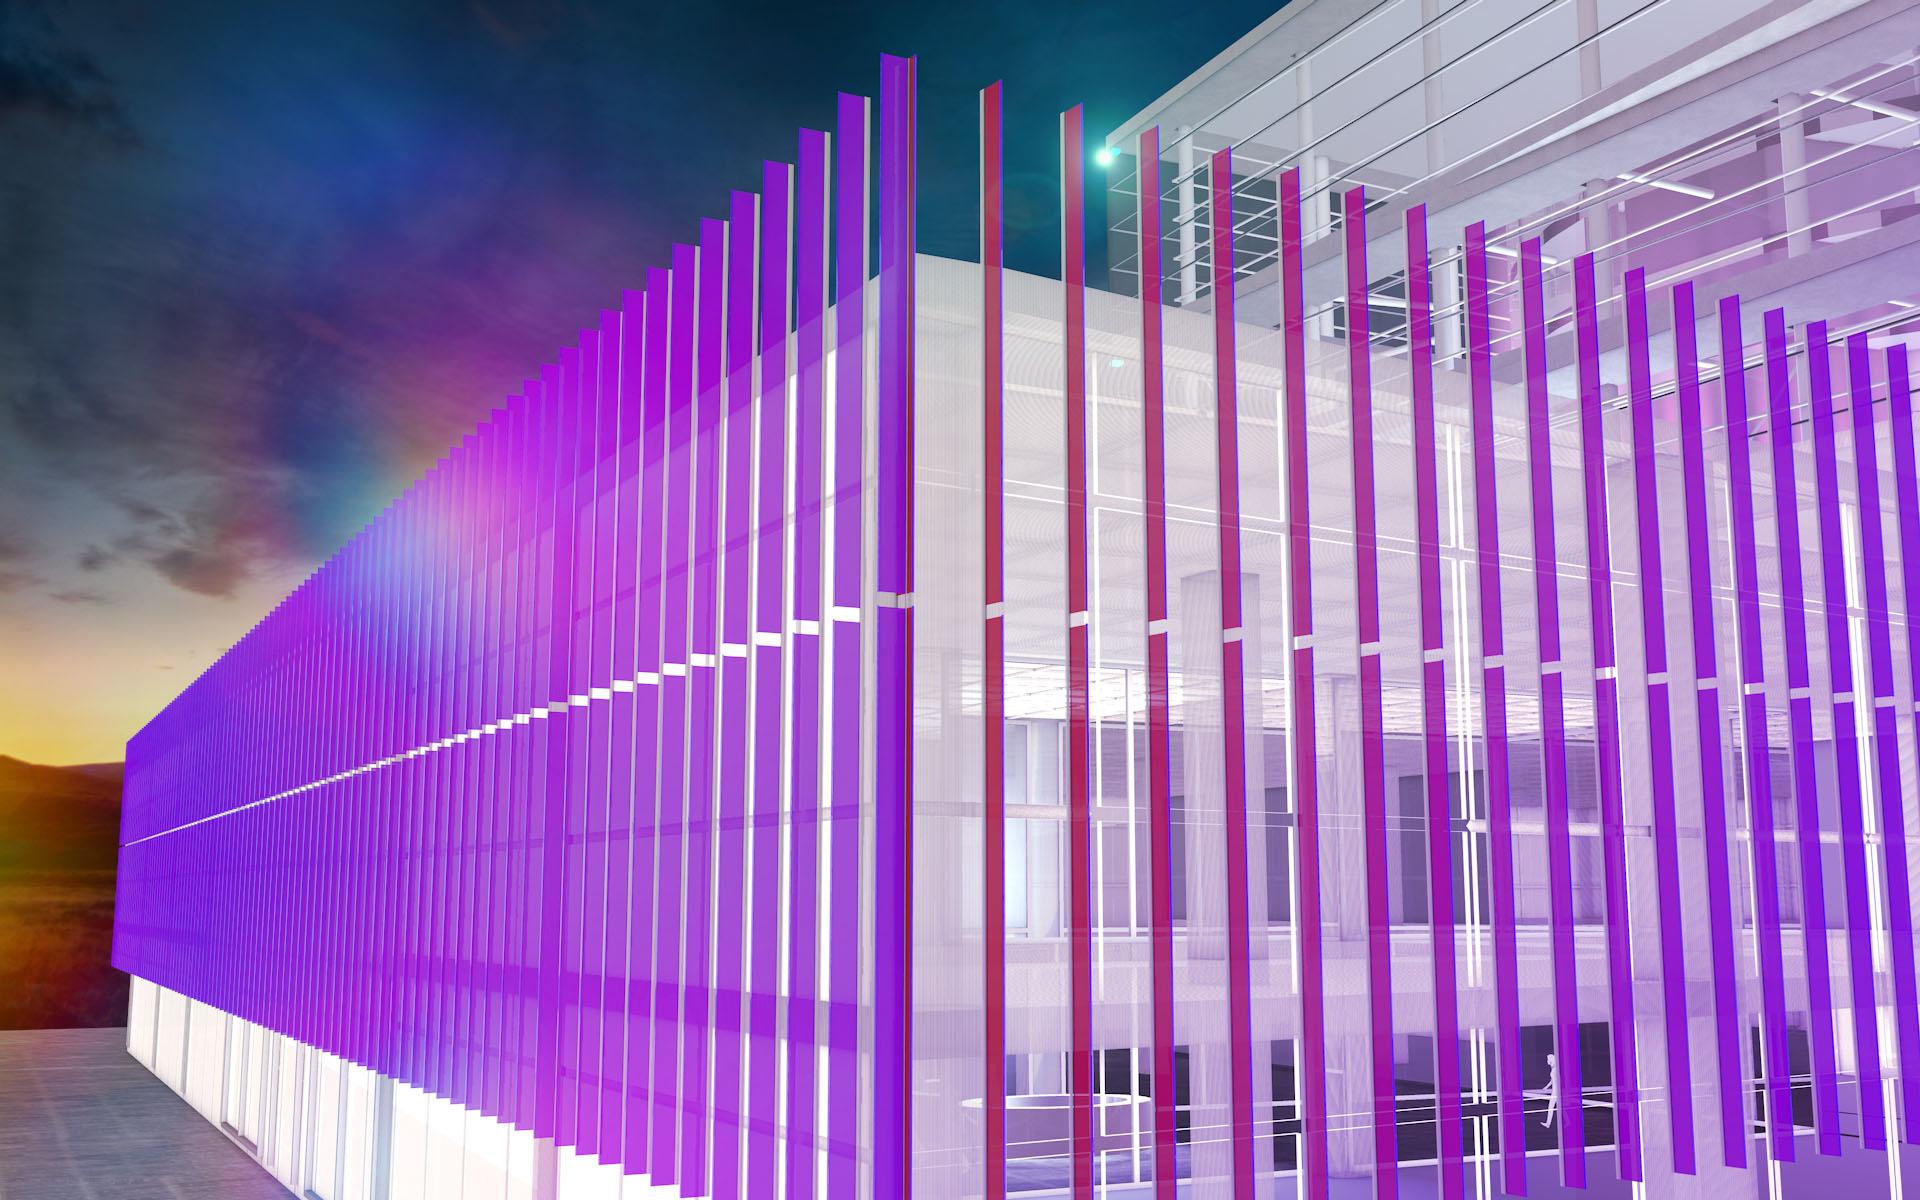 ForteBank, Astana, Kazakhstan - Système des lamelles de verre - Conception et image : Alexandre Kolinka